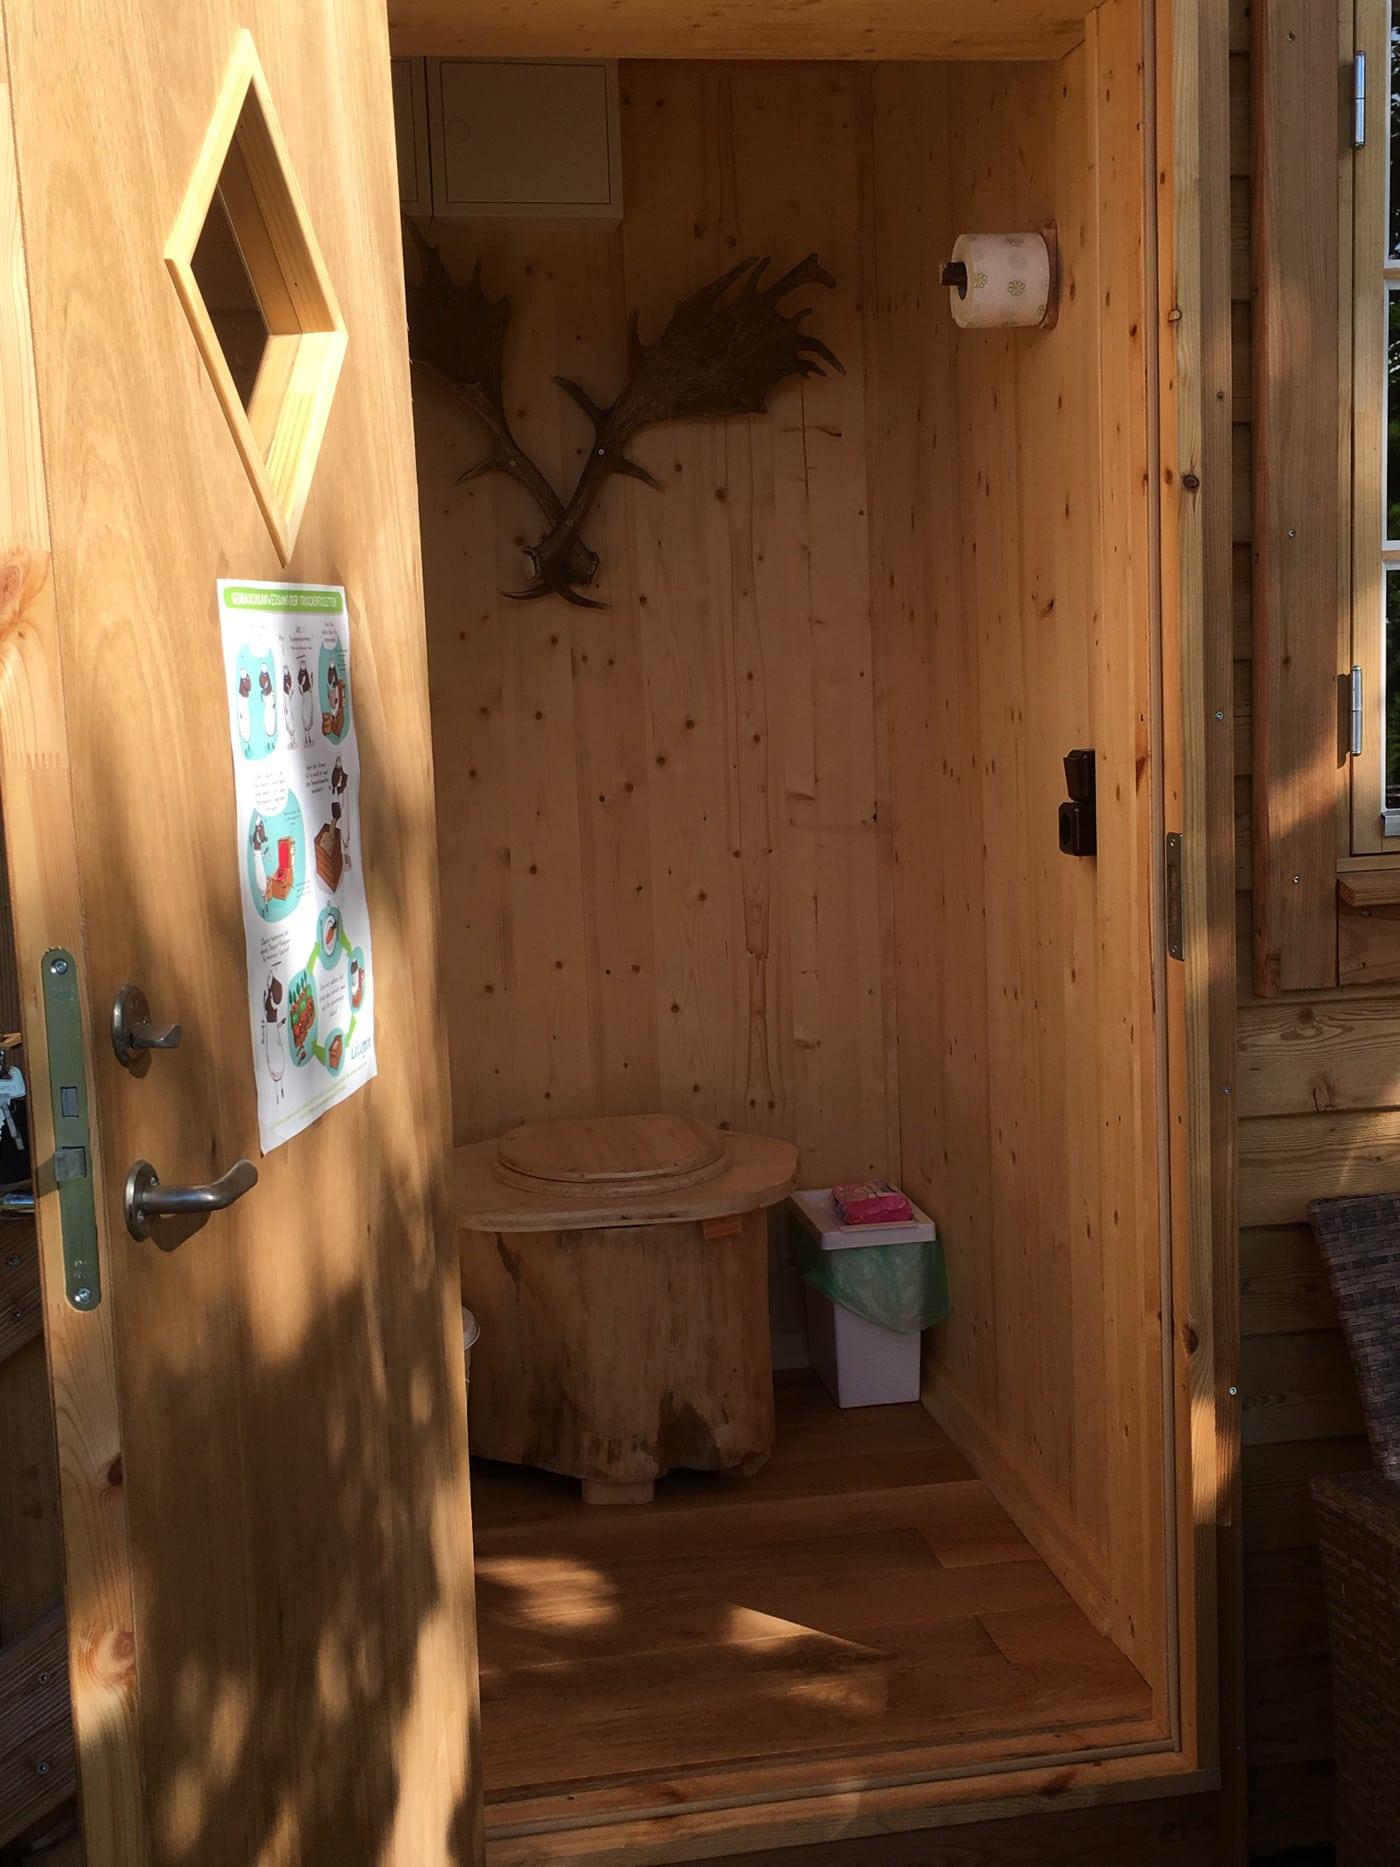 Toilette im Baumhaus // HIMBEER